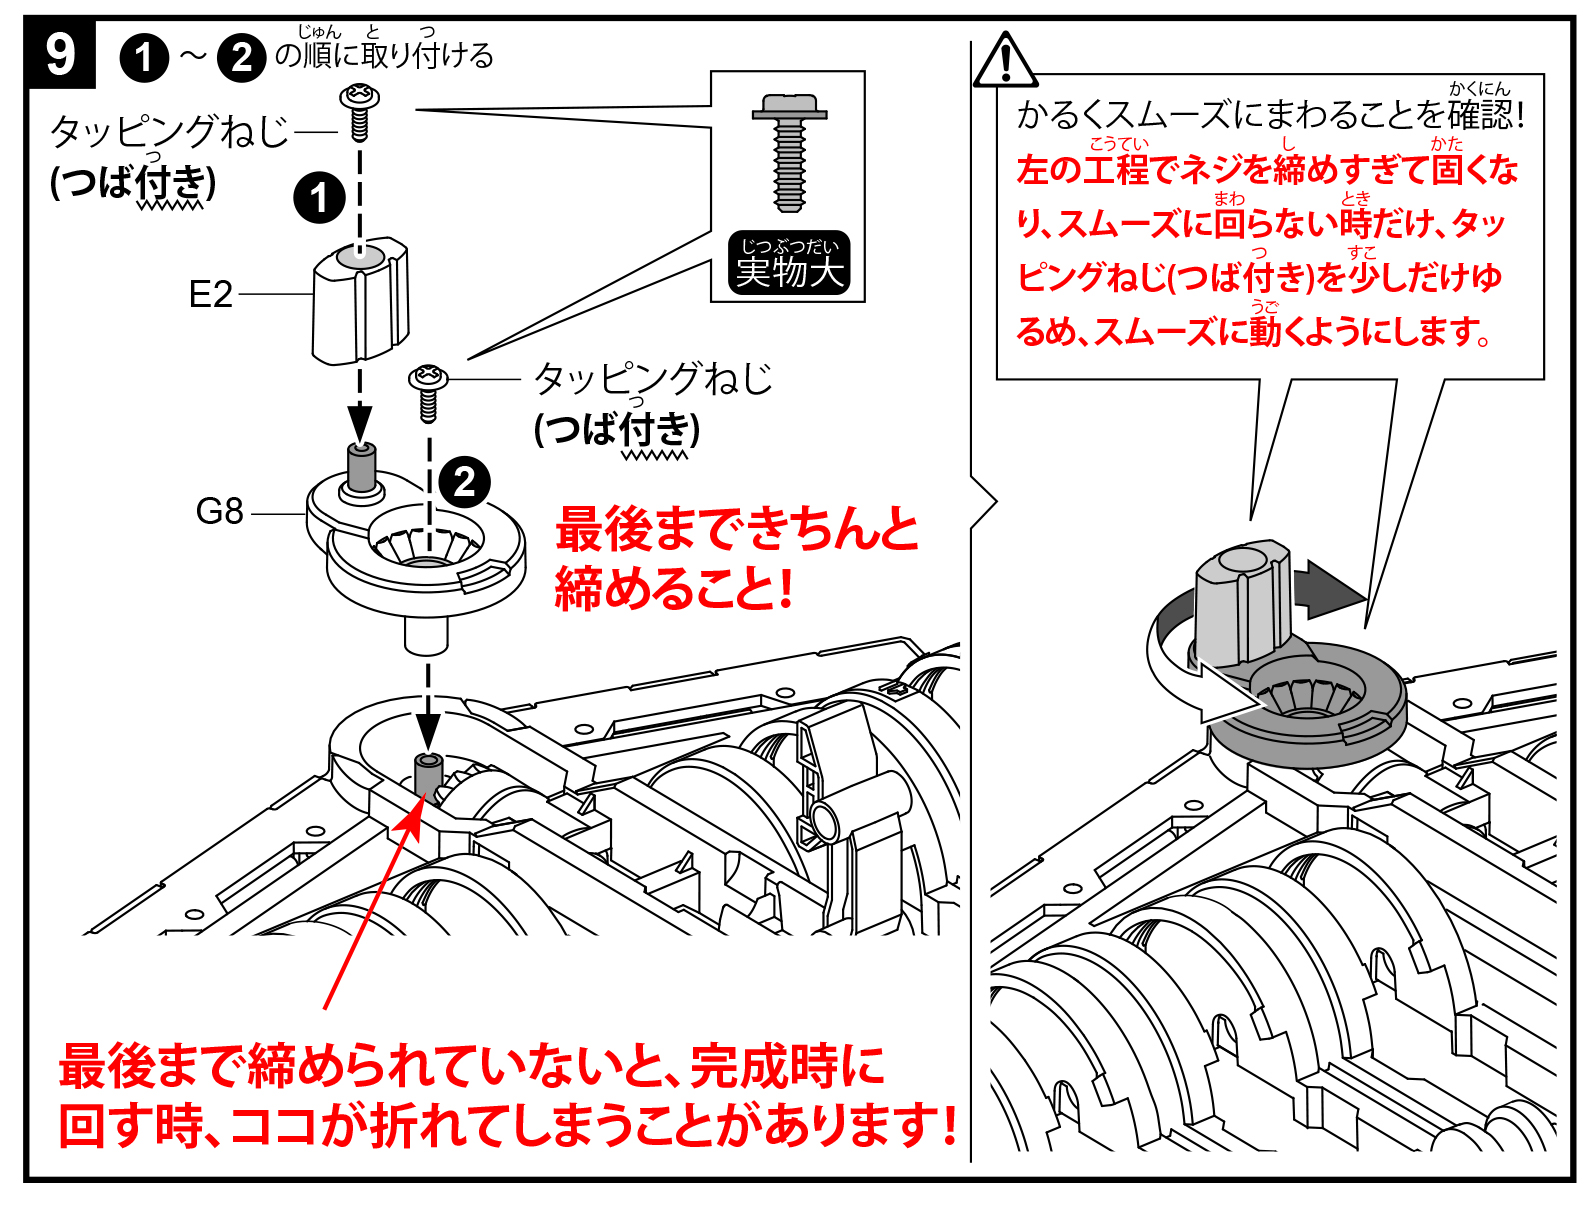 P11ネジ締め注意.jpg